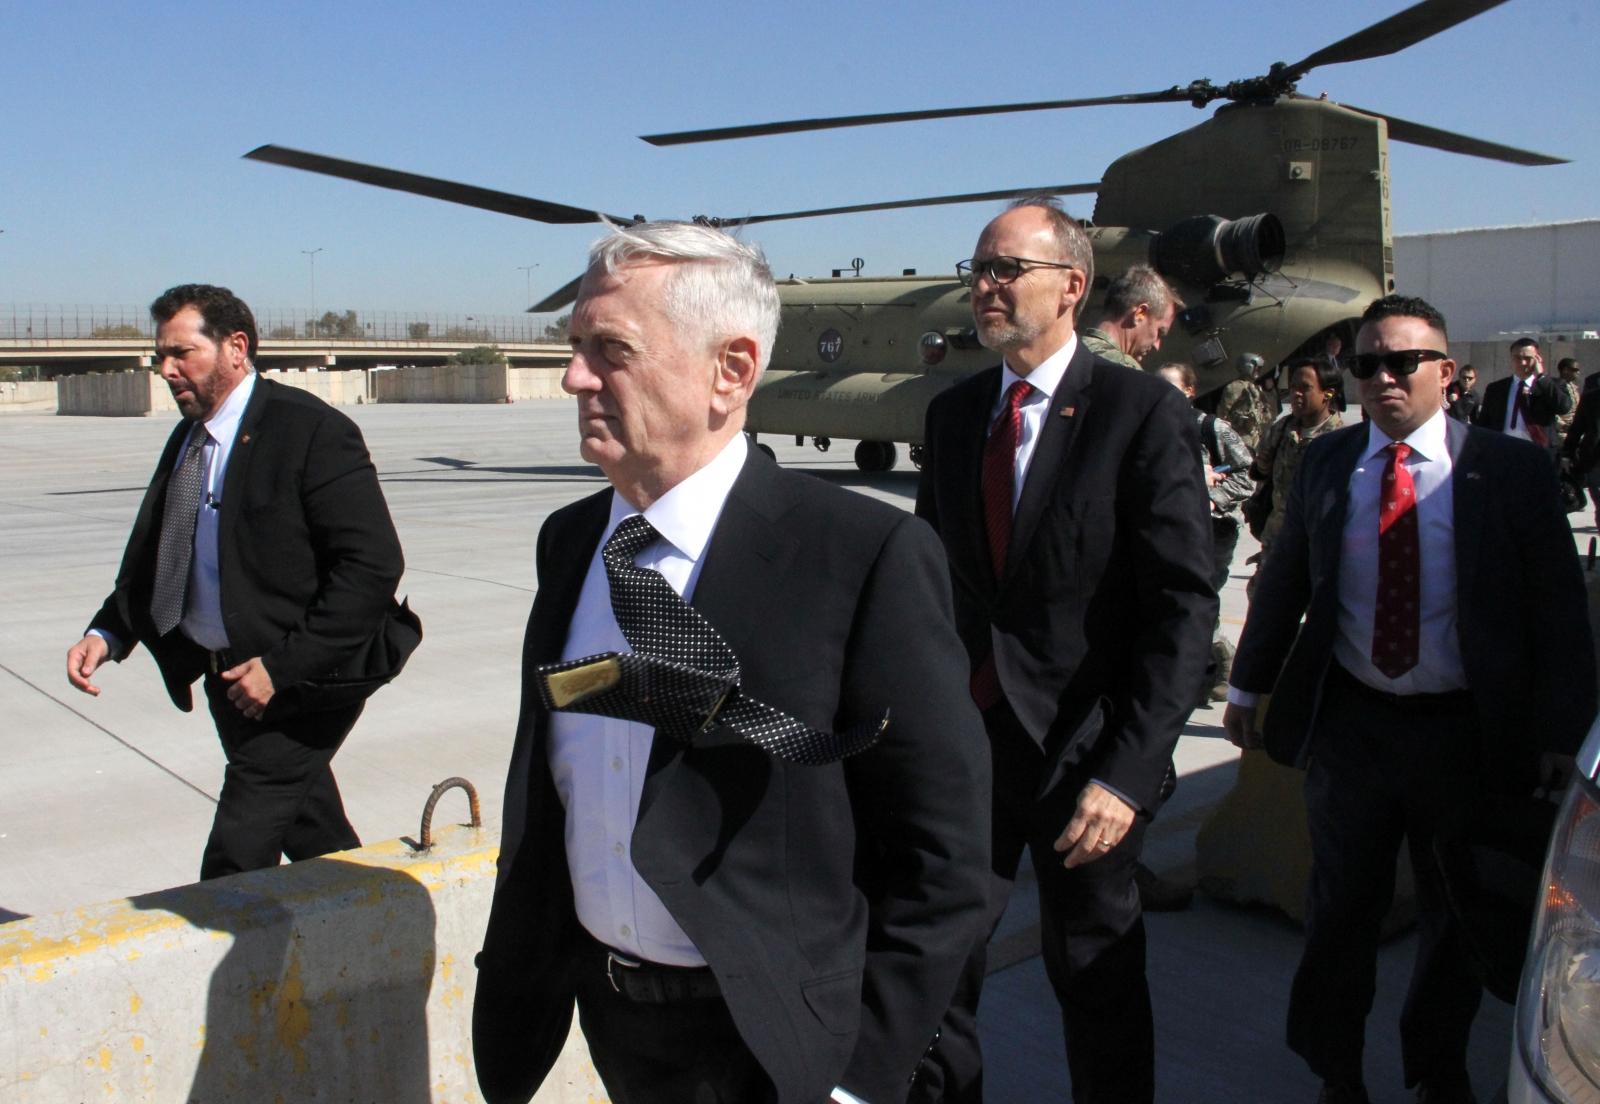 Us Serviceman Dies In Iraq As Defence Secretary Jim Mattis